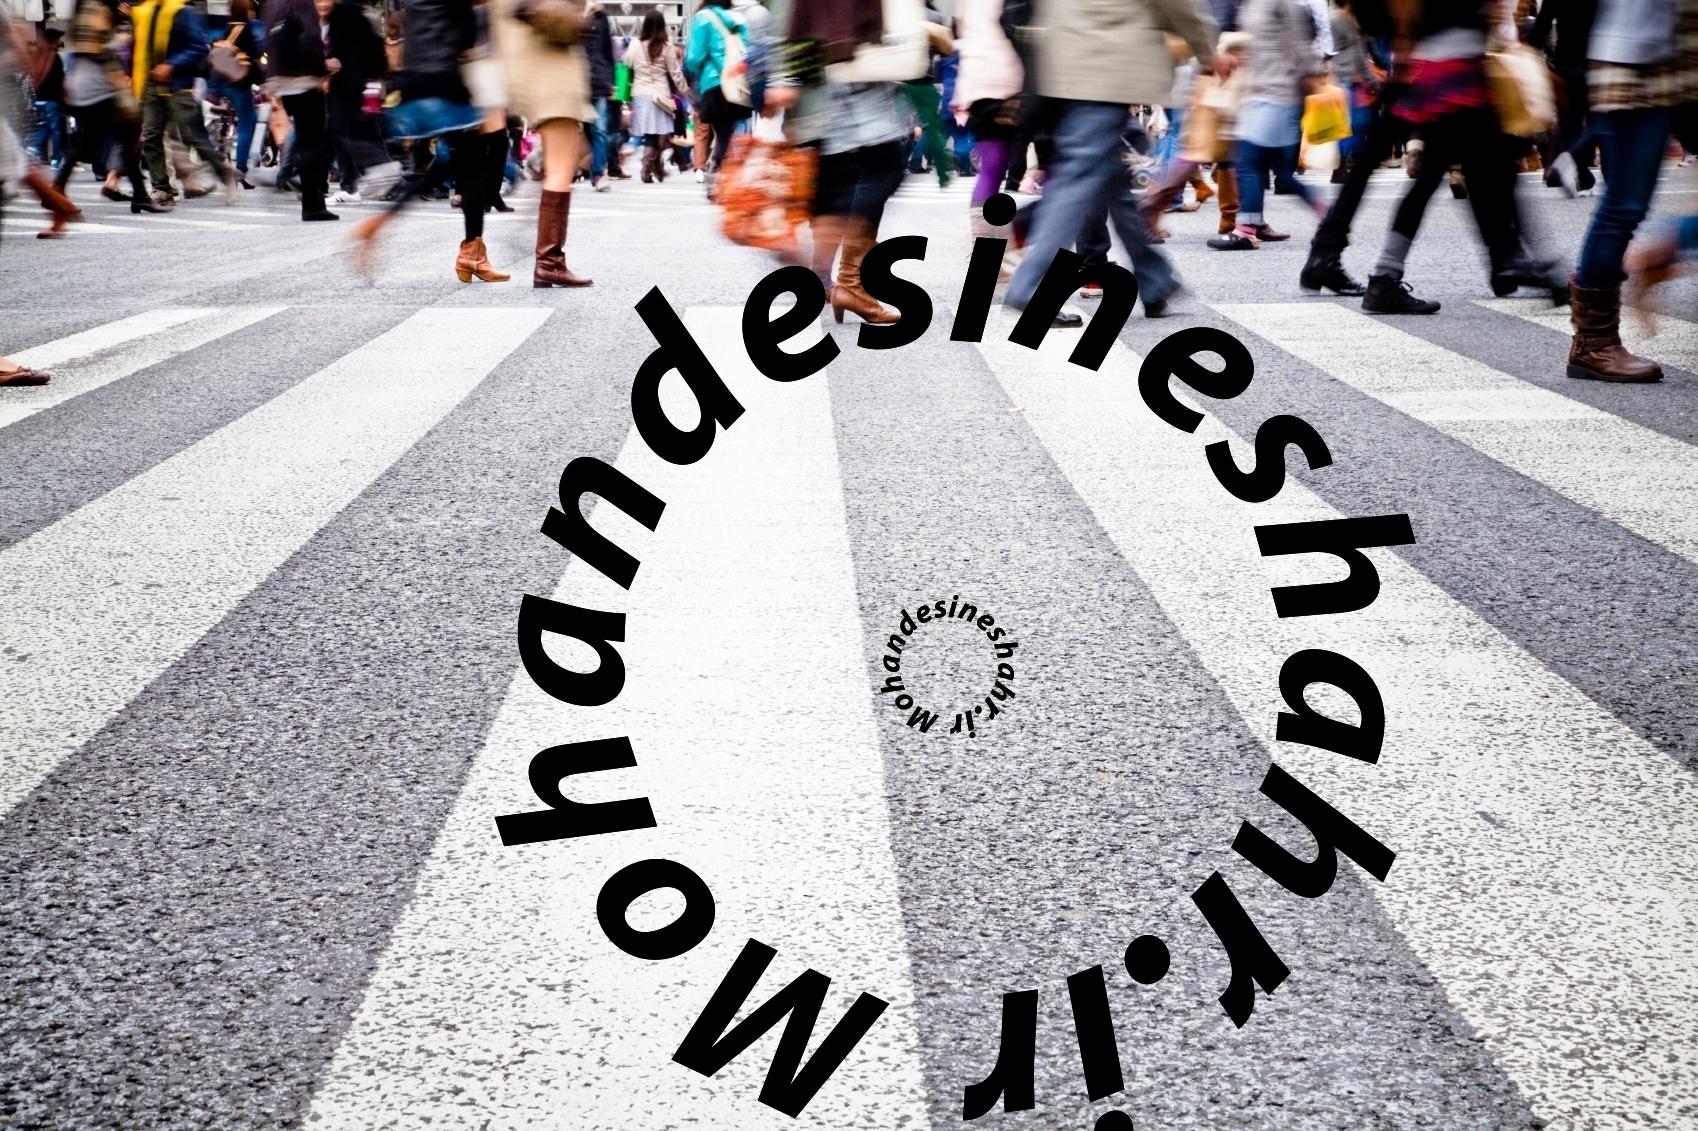 pedestrian crossing - نگاهي به مشکلات رفت و آمد شهروندان از خطوط عابر پياده خيابانها